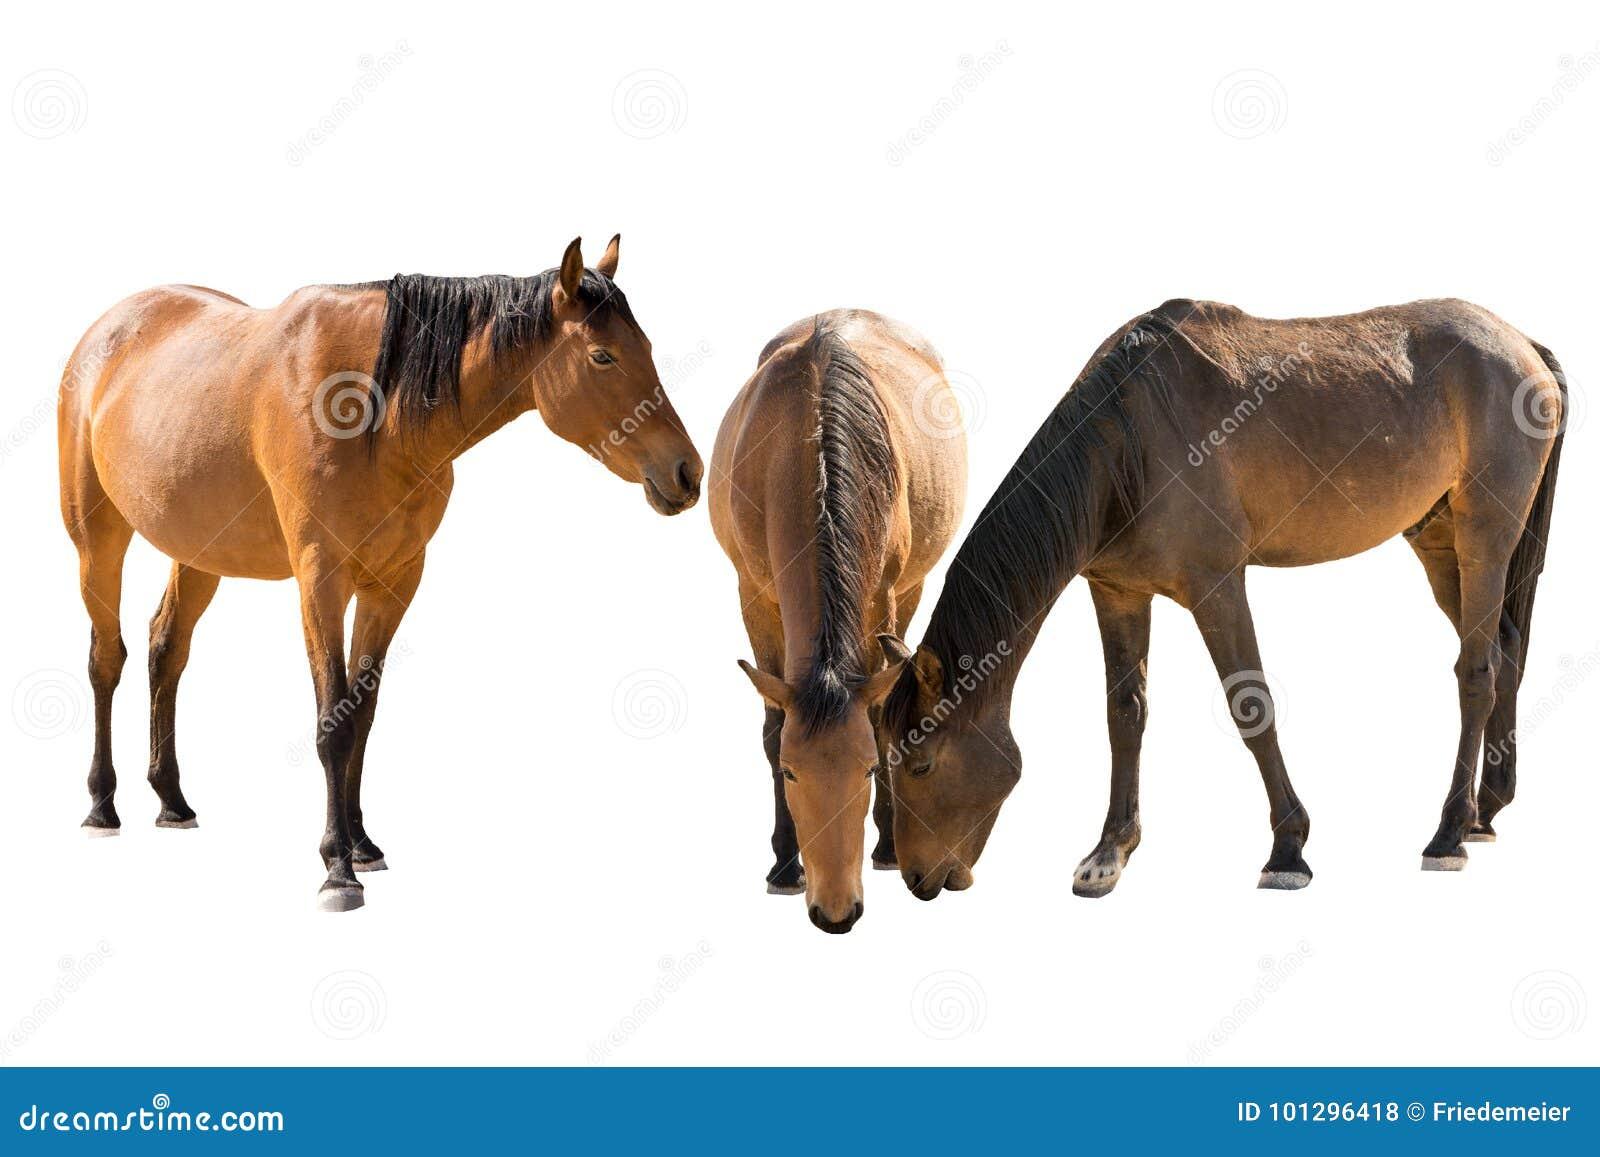 Set of three namibian wild horses portraits